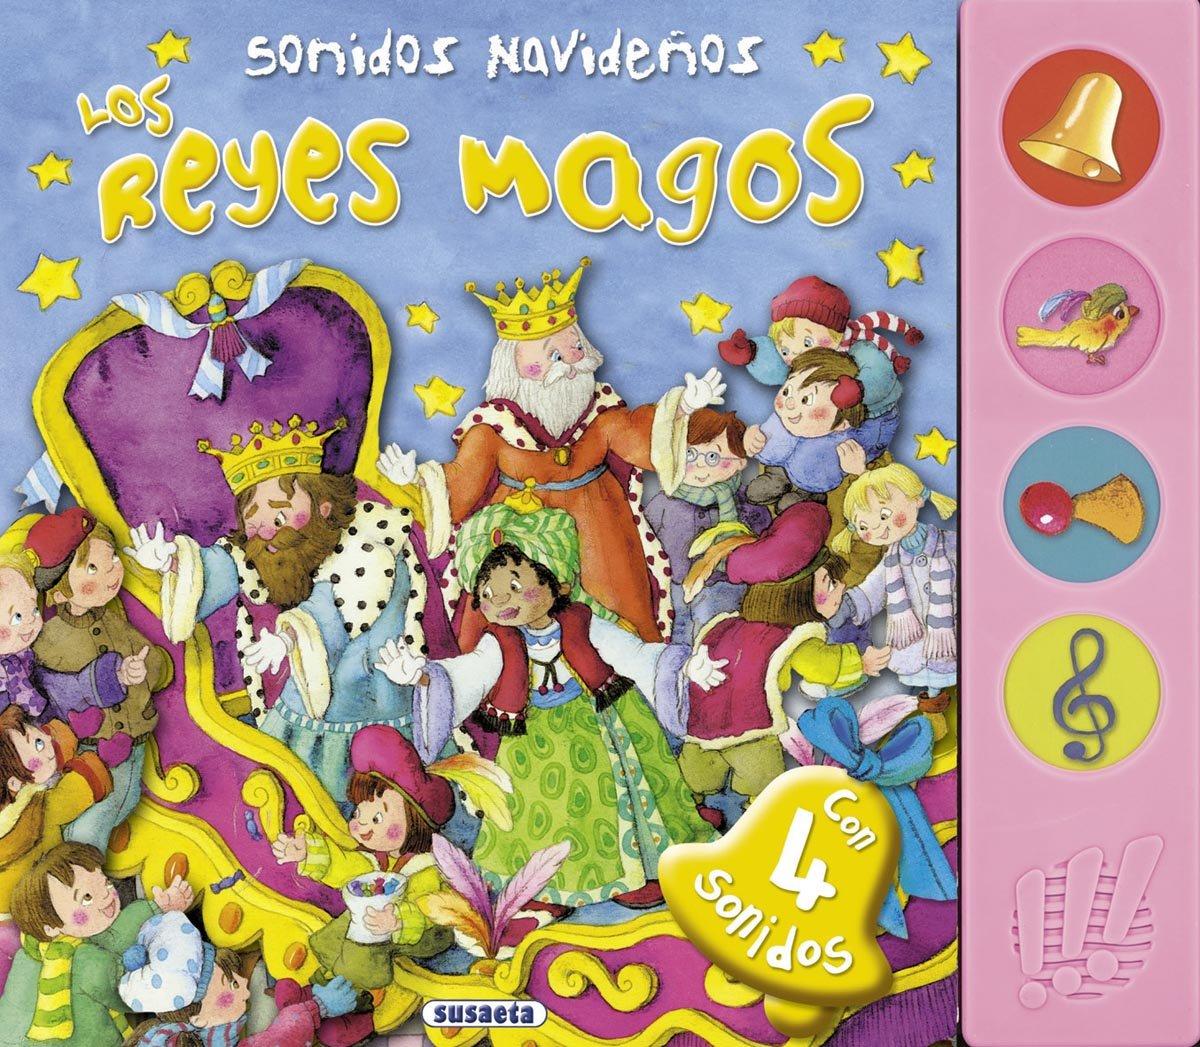 Sonidos navideños. Los Reyes Magos (Sonidos Navid.Reyes Magos)